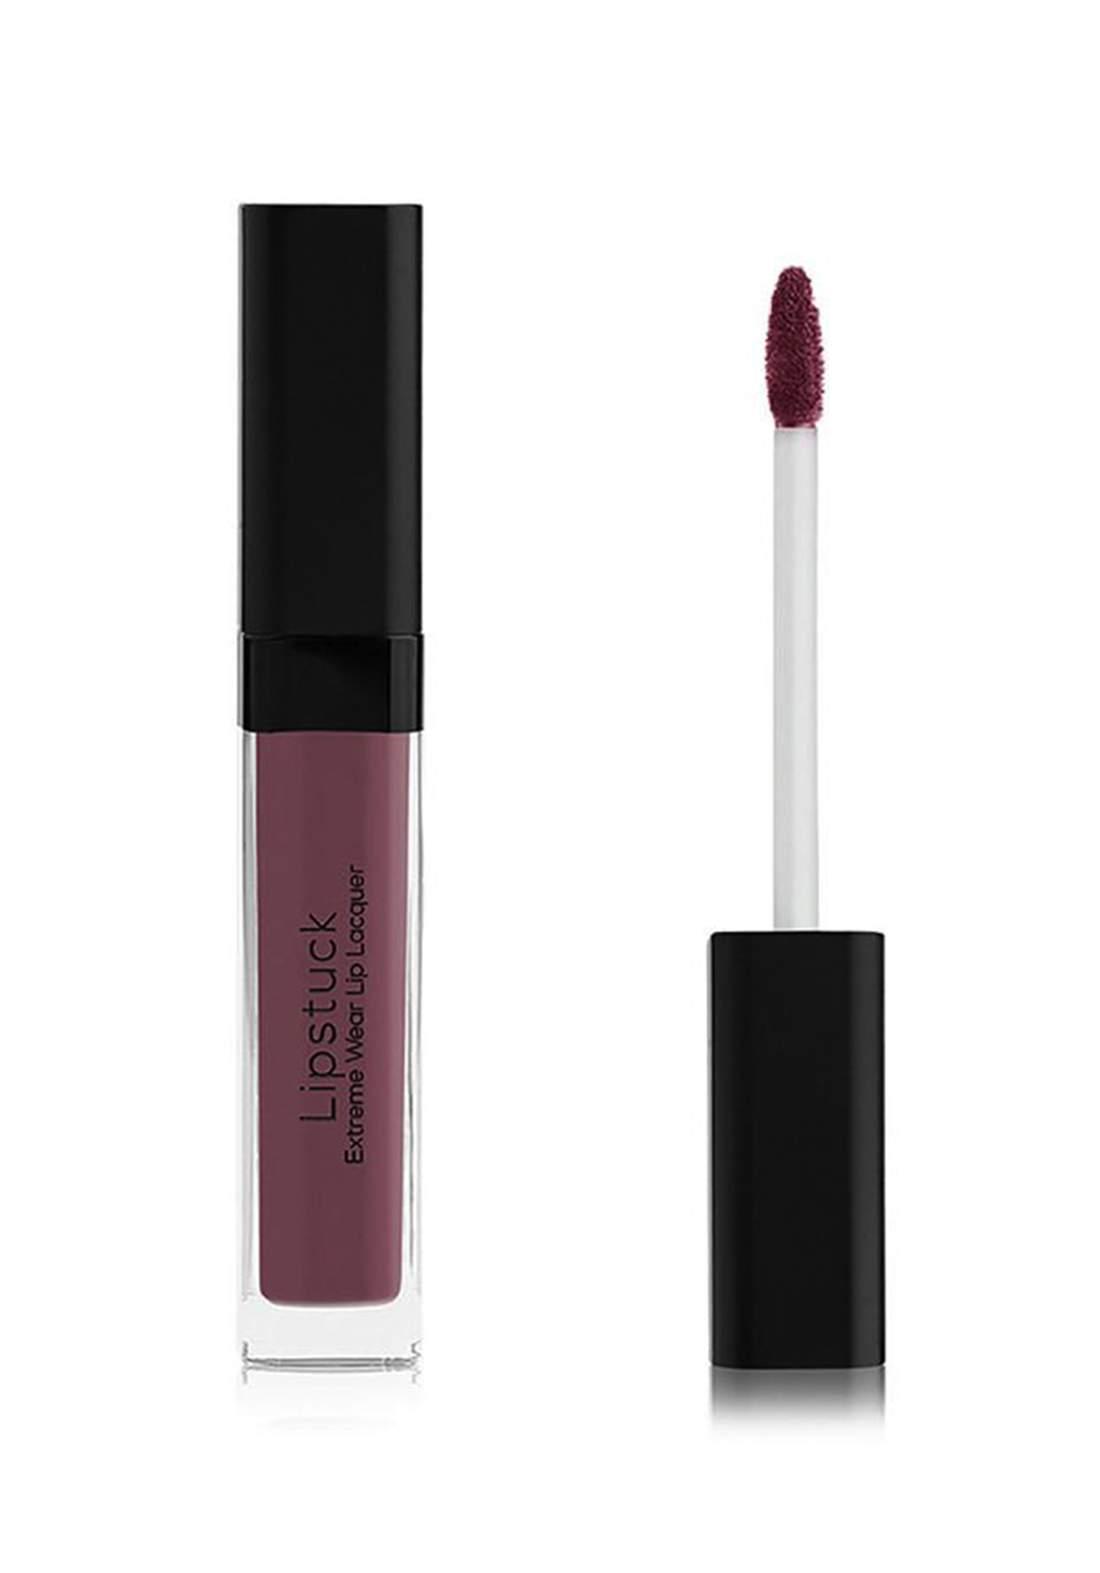 Wow by Wojooh 6G33 Lipstuck Extreme Wear Lip Lacquer No.690 Velvet Violet 6.5ml احمر شفاه